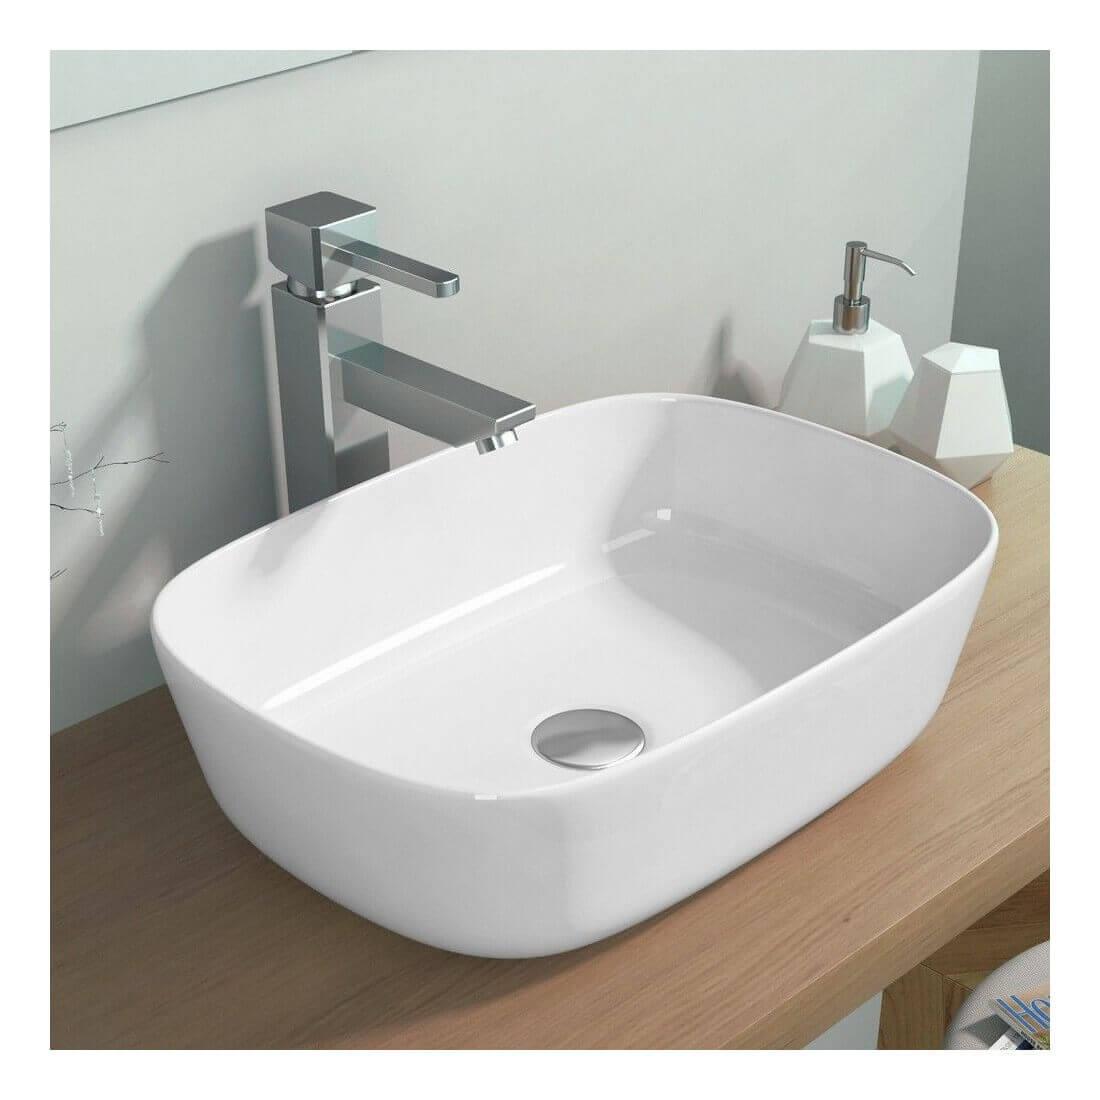 Comprar lavabo cer mica extra fino sobre encimera abby - Encimera para lavabo ...